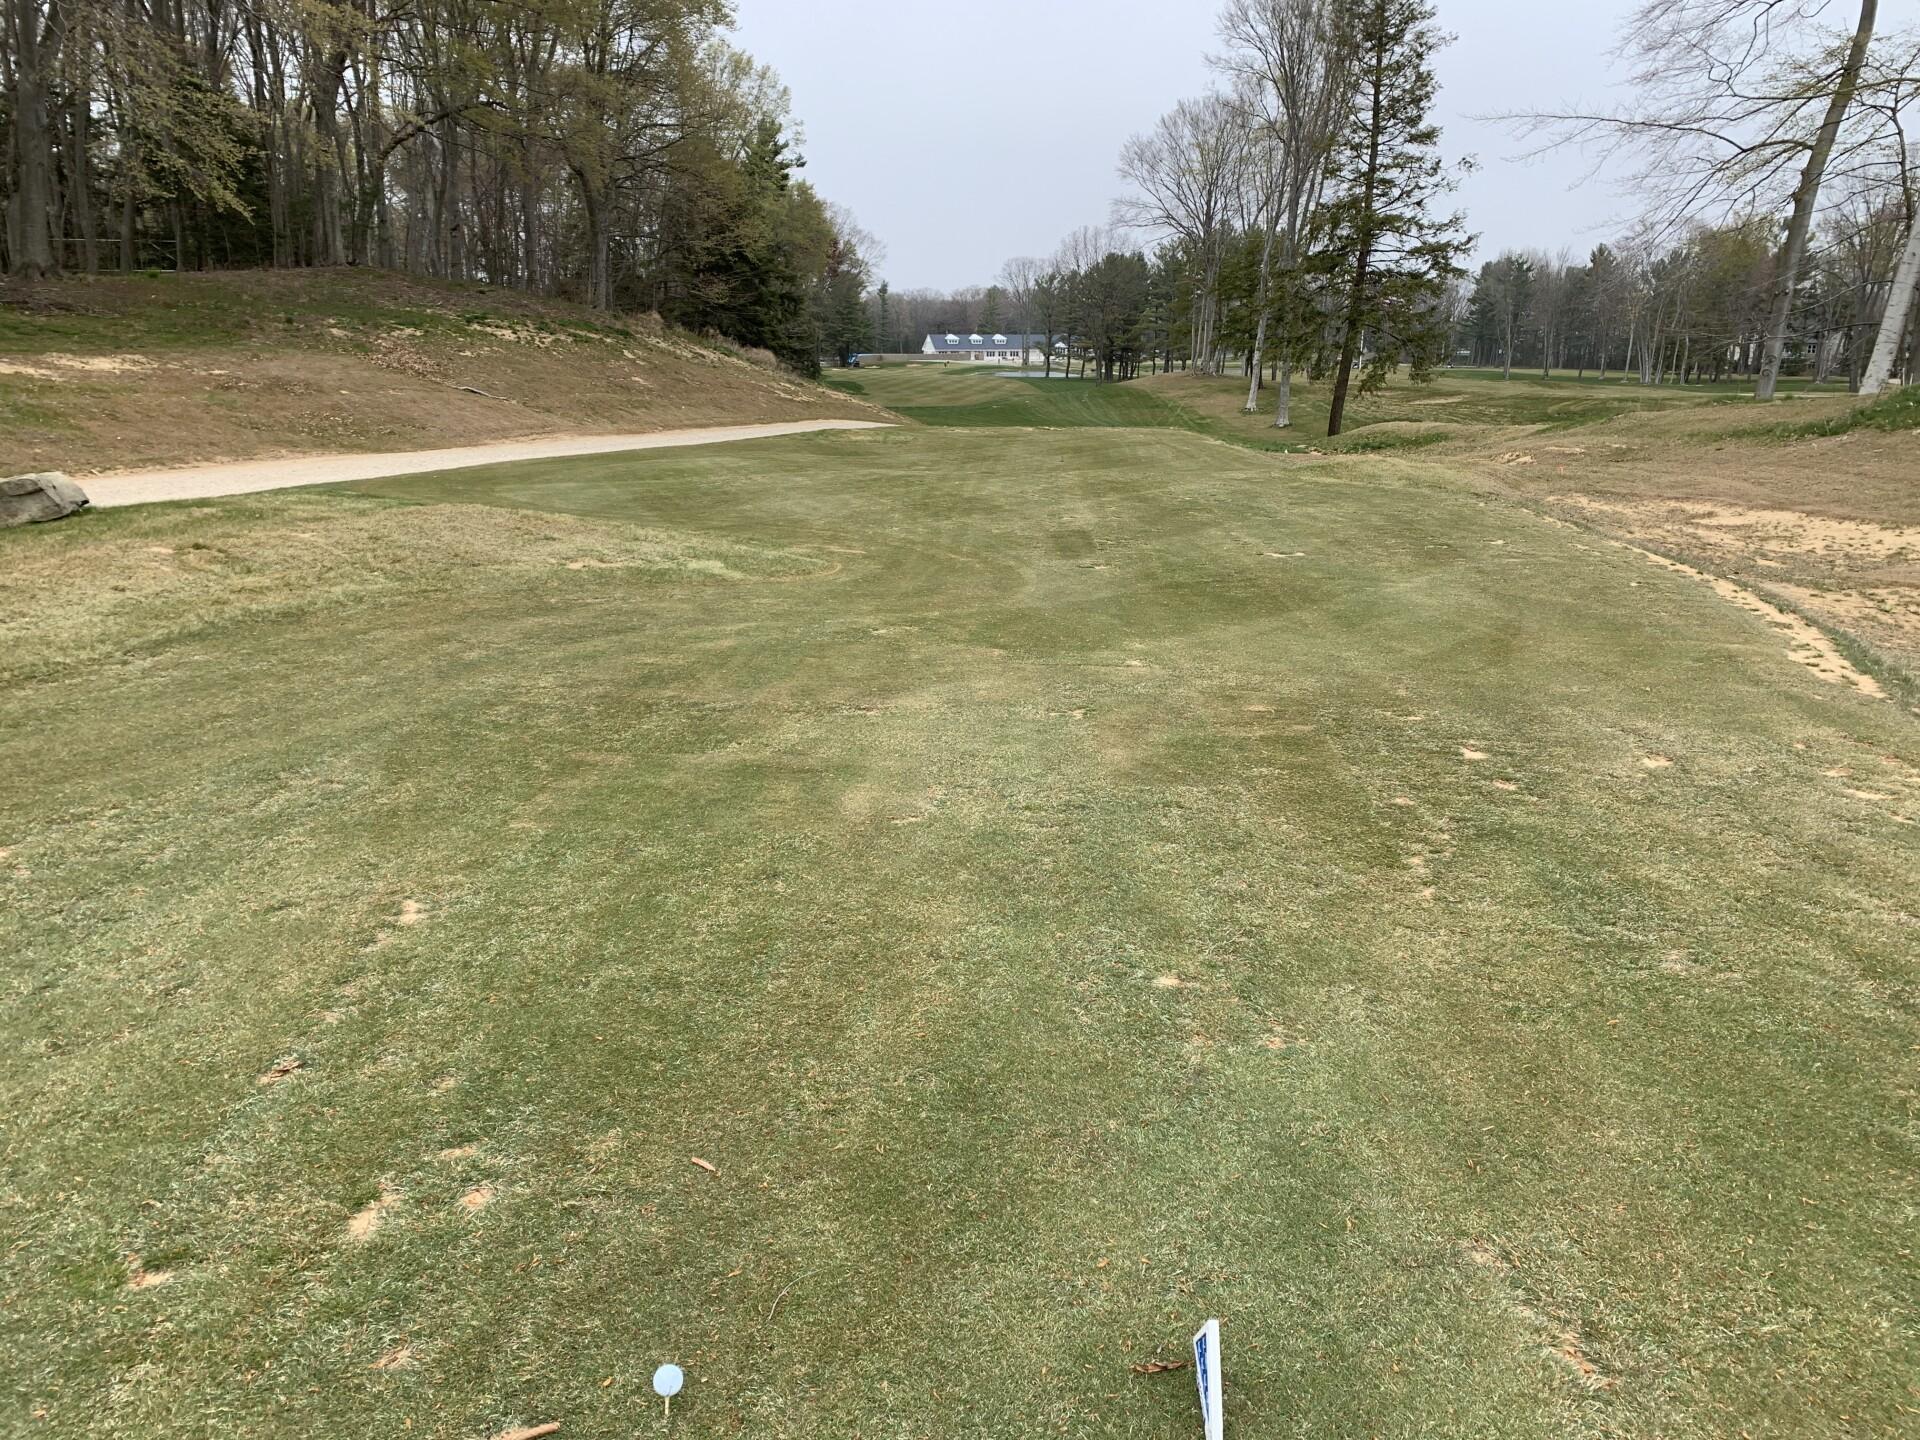 American-Dunes-Golf-Club-3.JPG